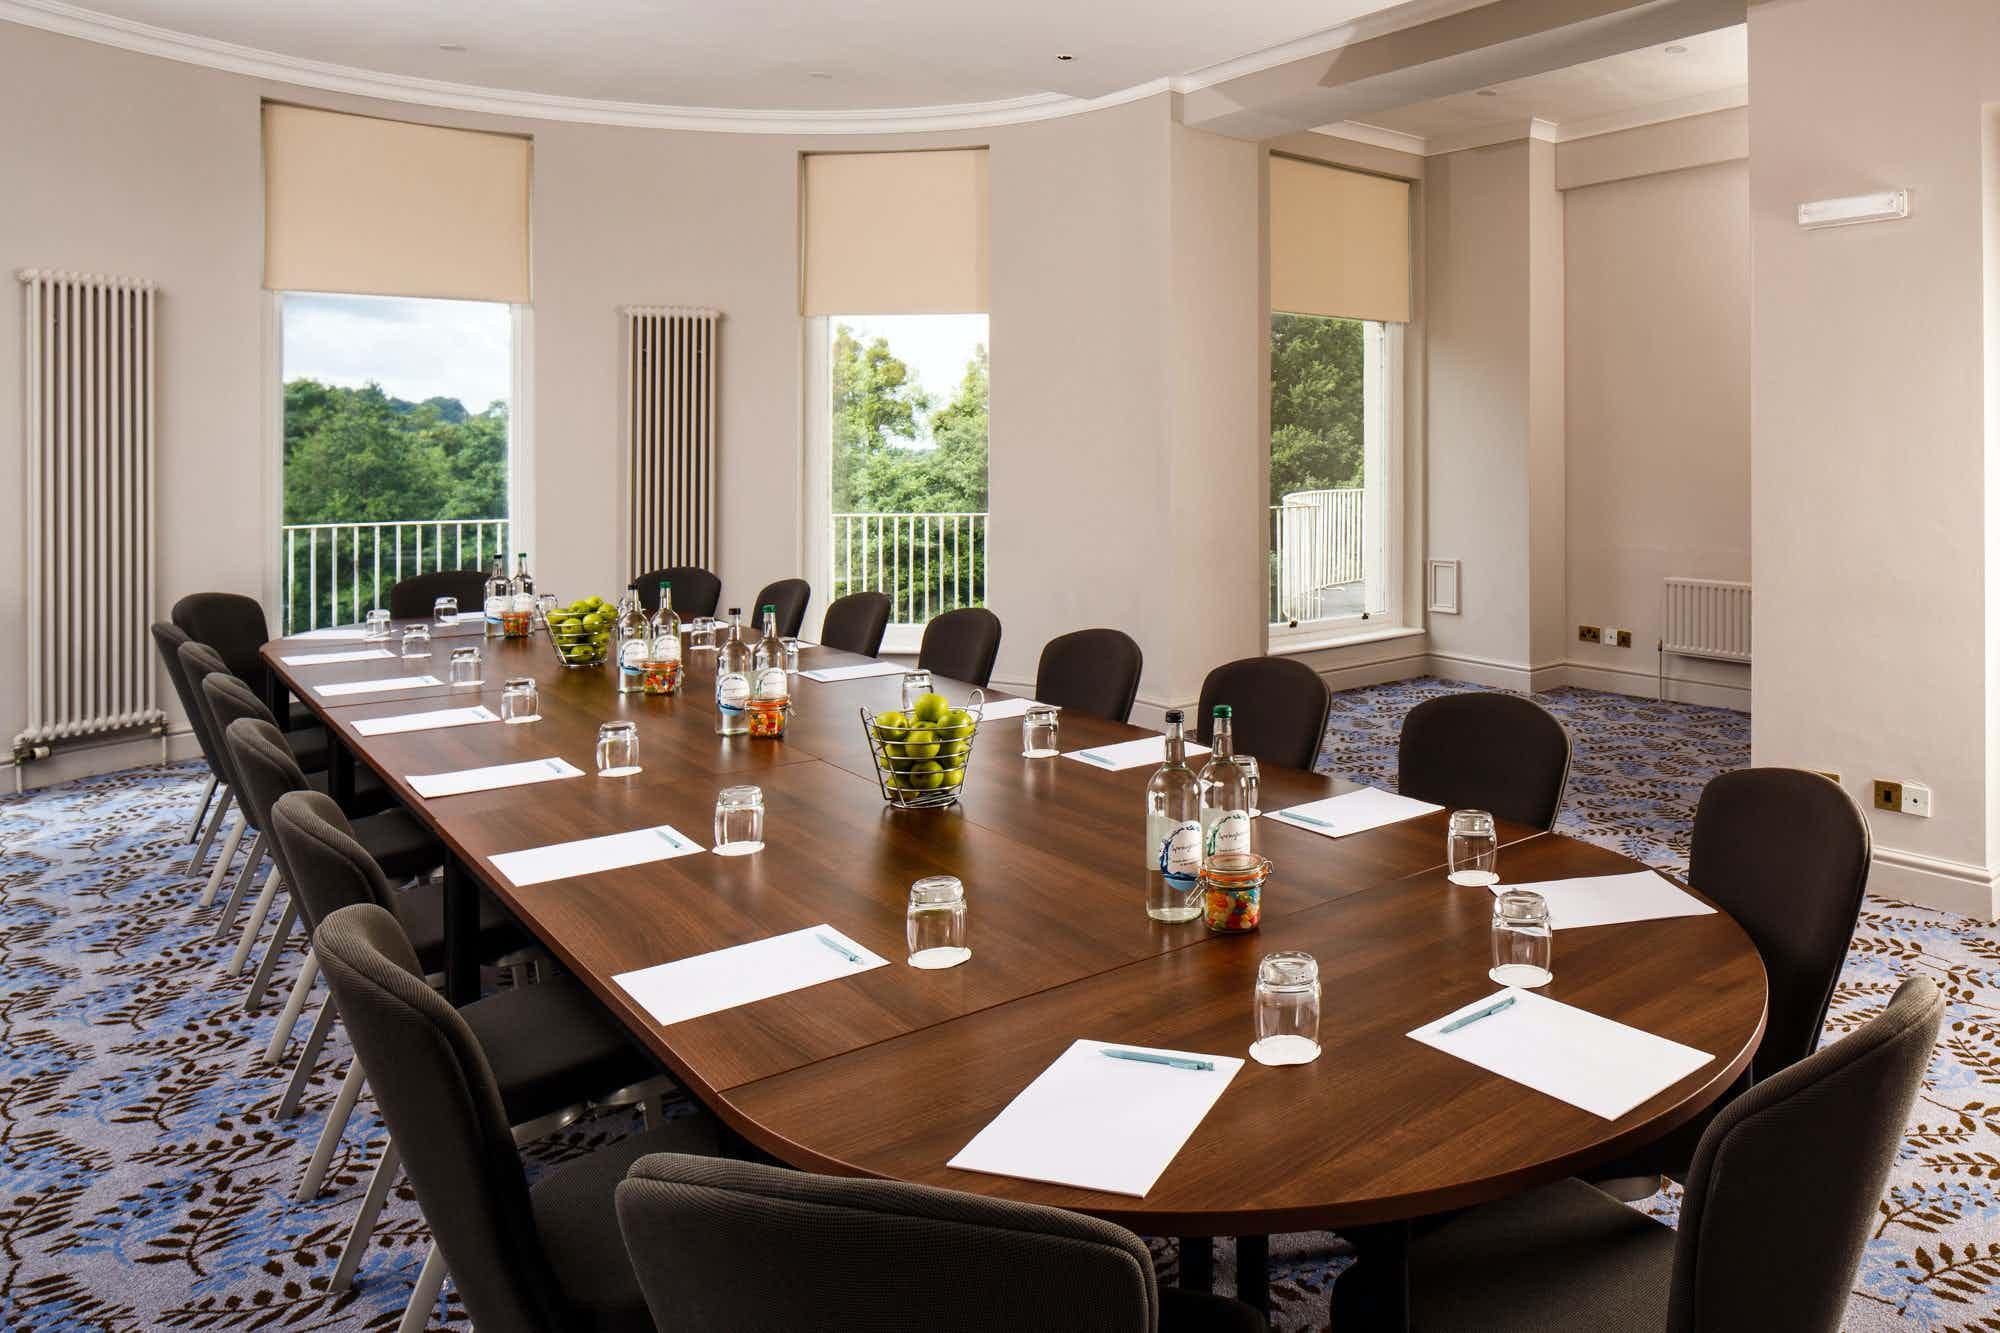 Congress Suite, Mercure Gloucester Bowden Hall Hotel